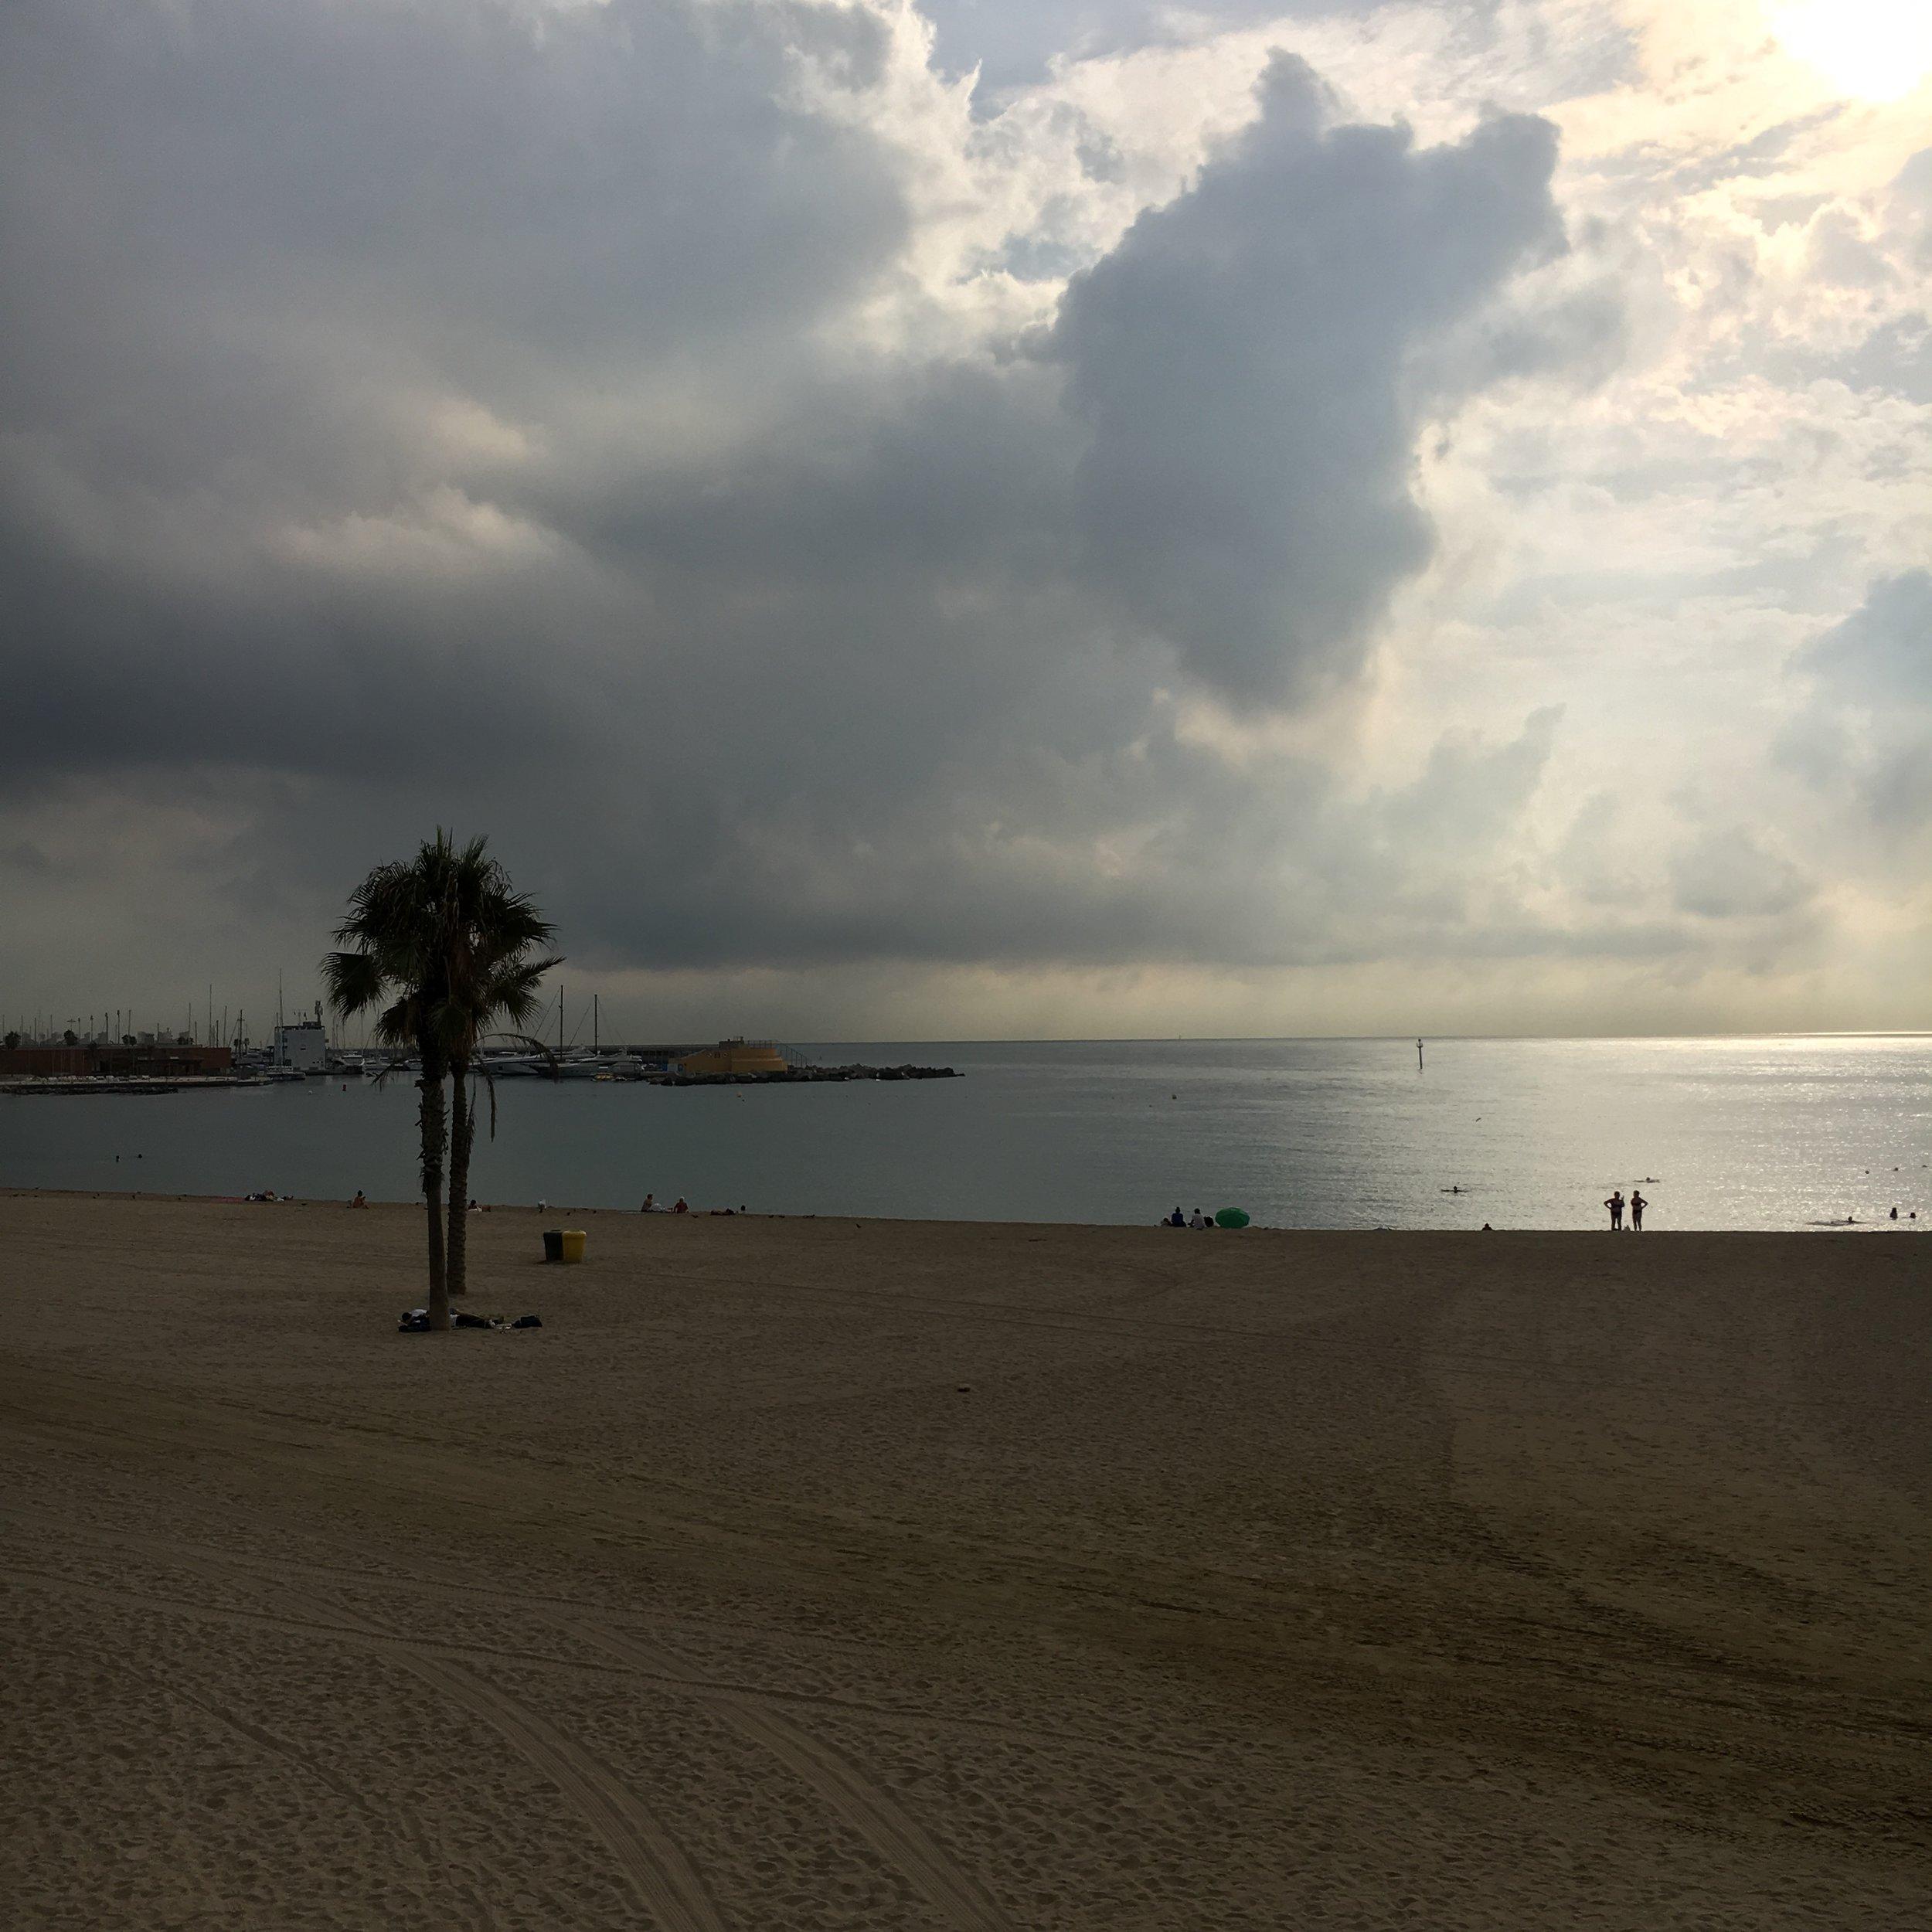 5-best-places-to-see-lagos-praia-dona-ana-cityoftheweek copy.jpg